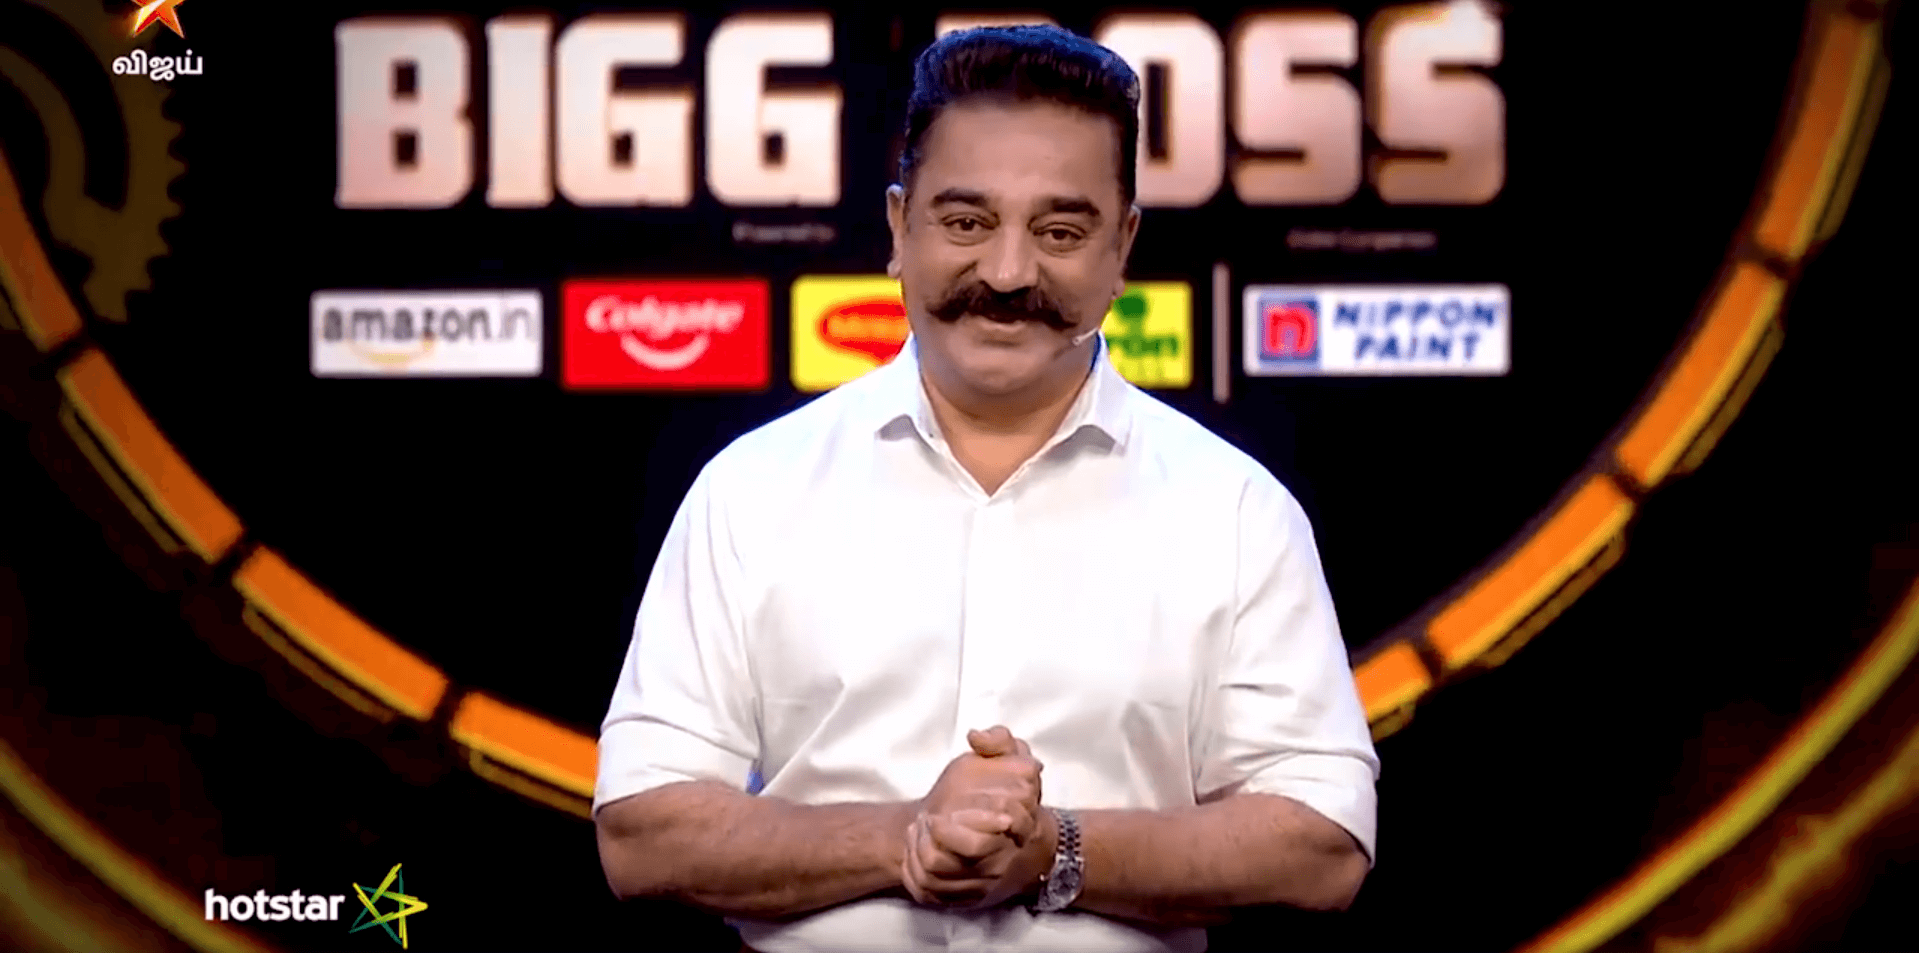 Bigg Boss 3 Tamil Vote Hotstar